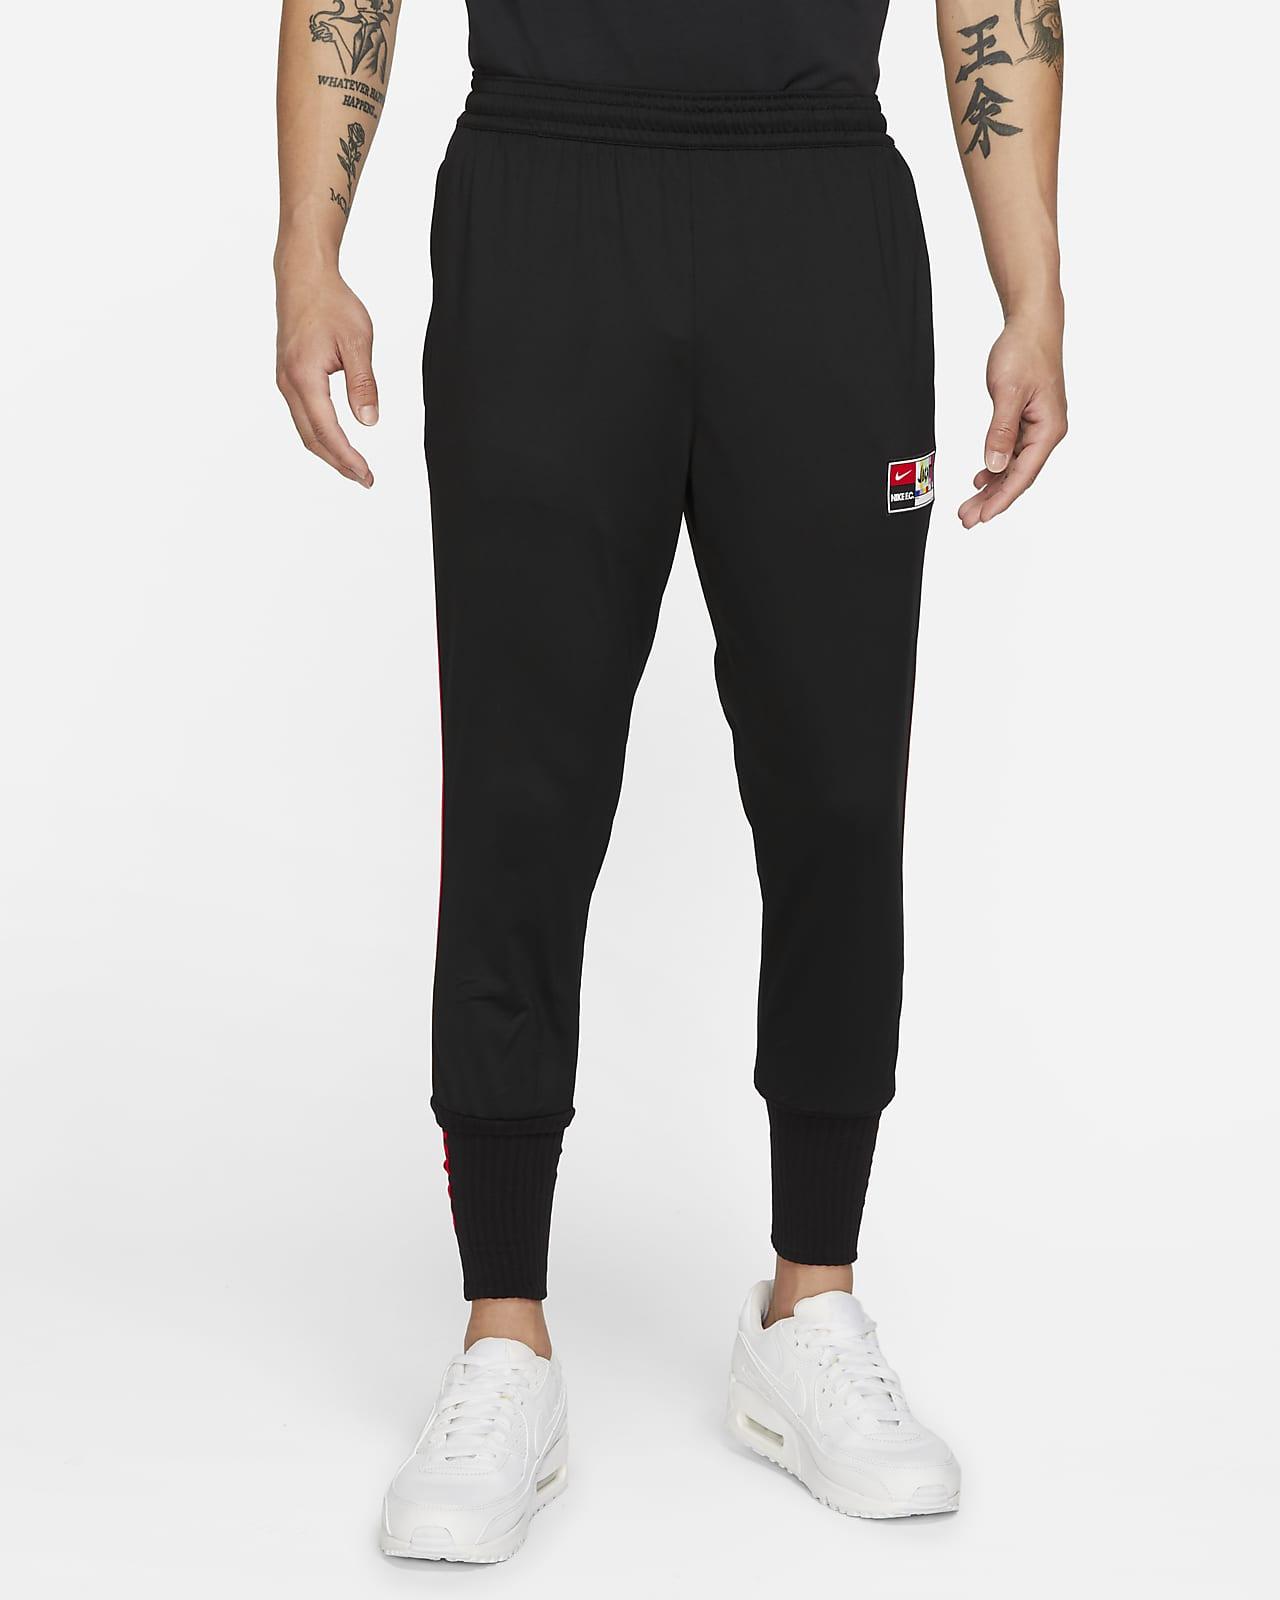 Nike F.C. Men's Cuffed Knit Soccer Pants